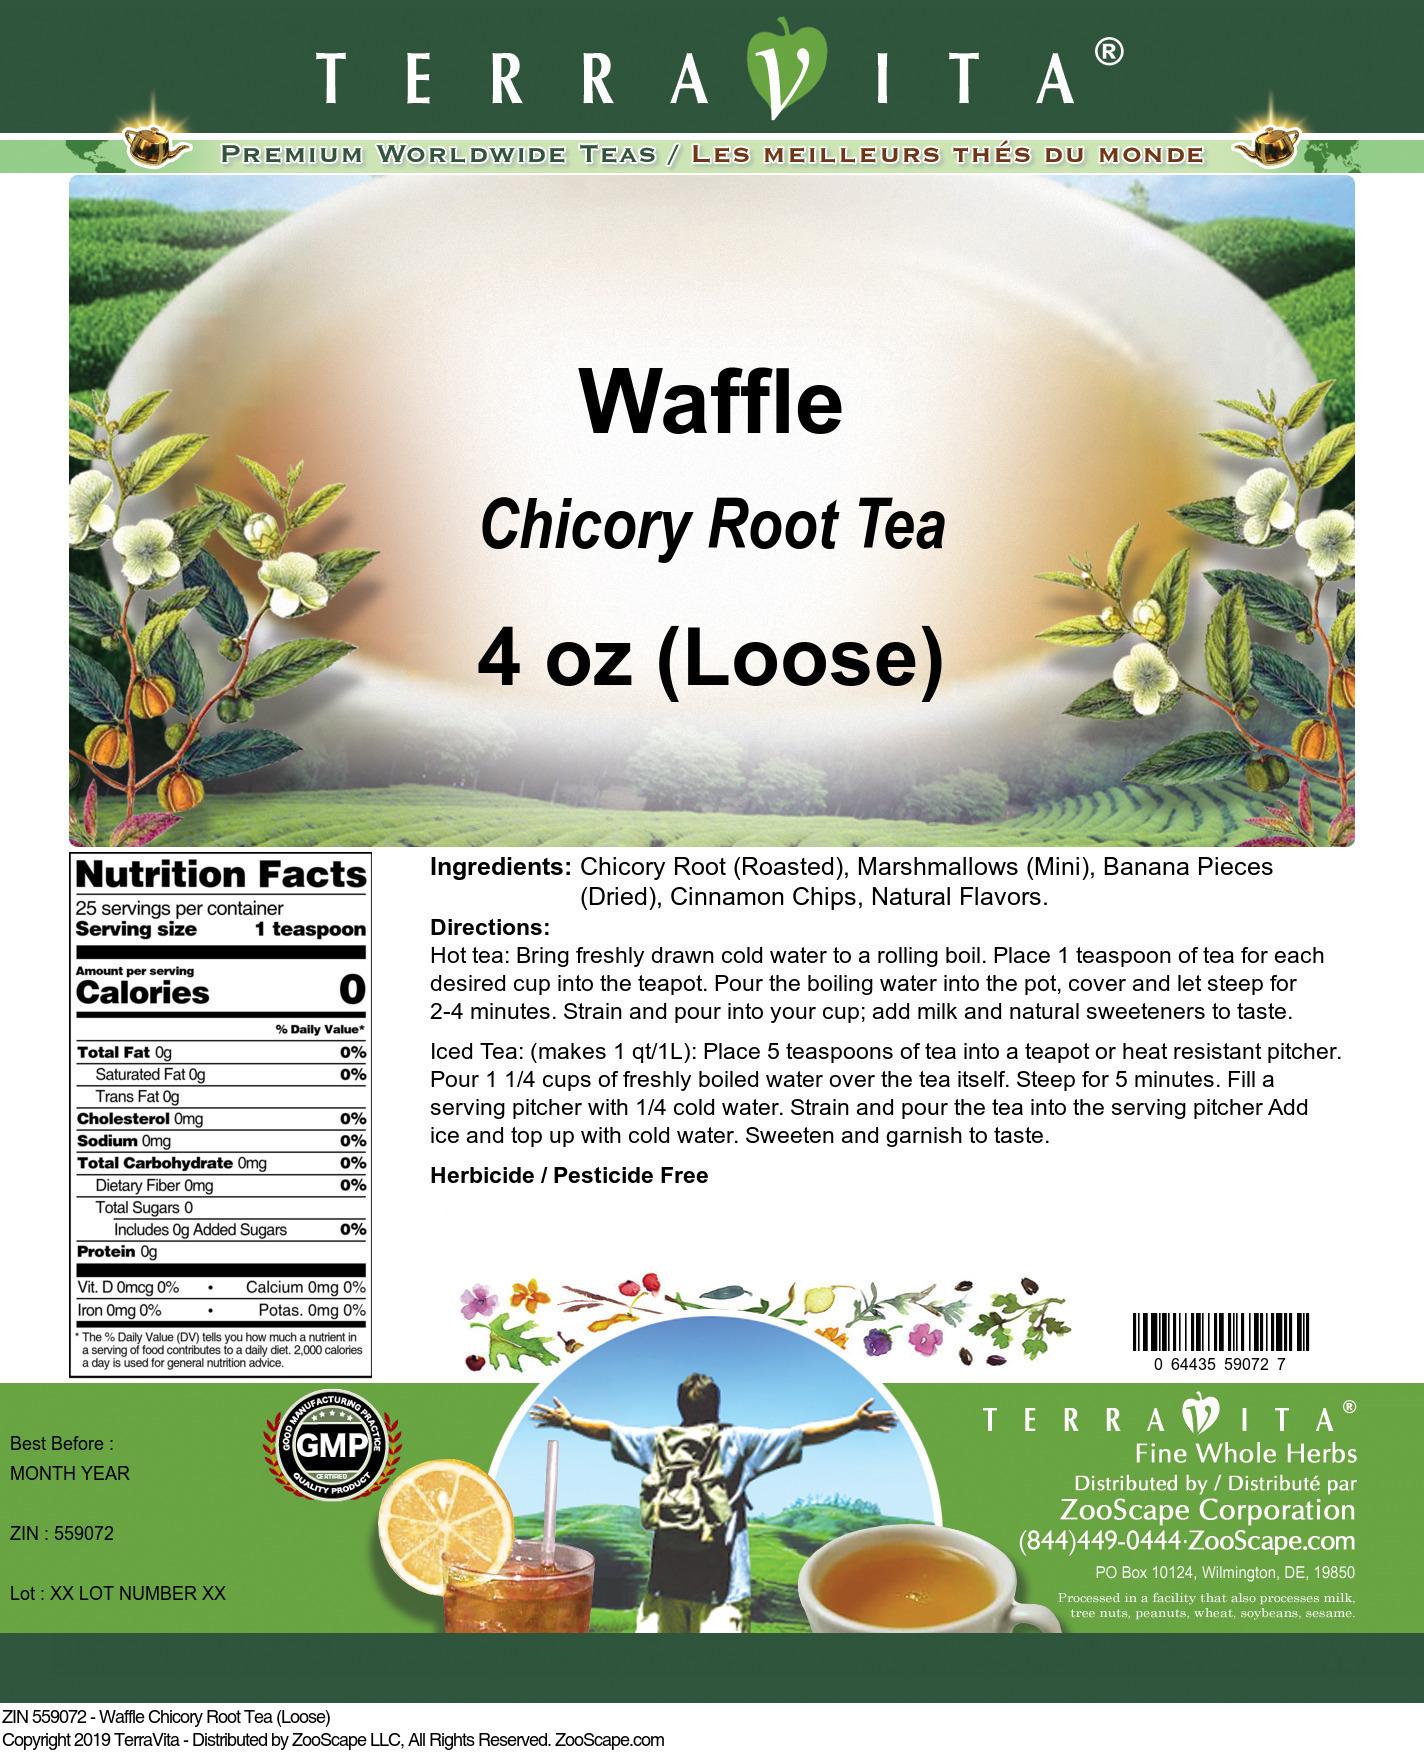 Waffle Chicory Root Tea (Loose)